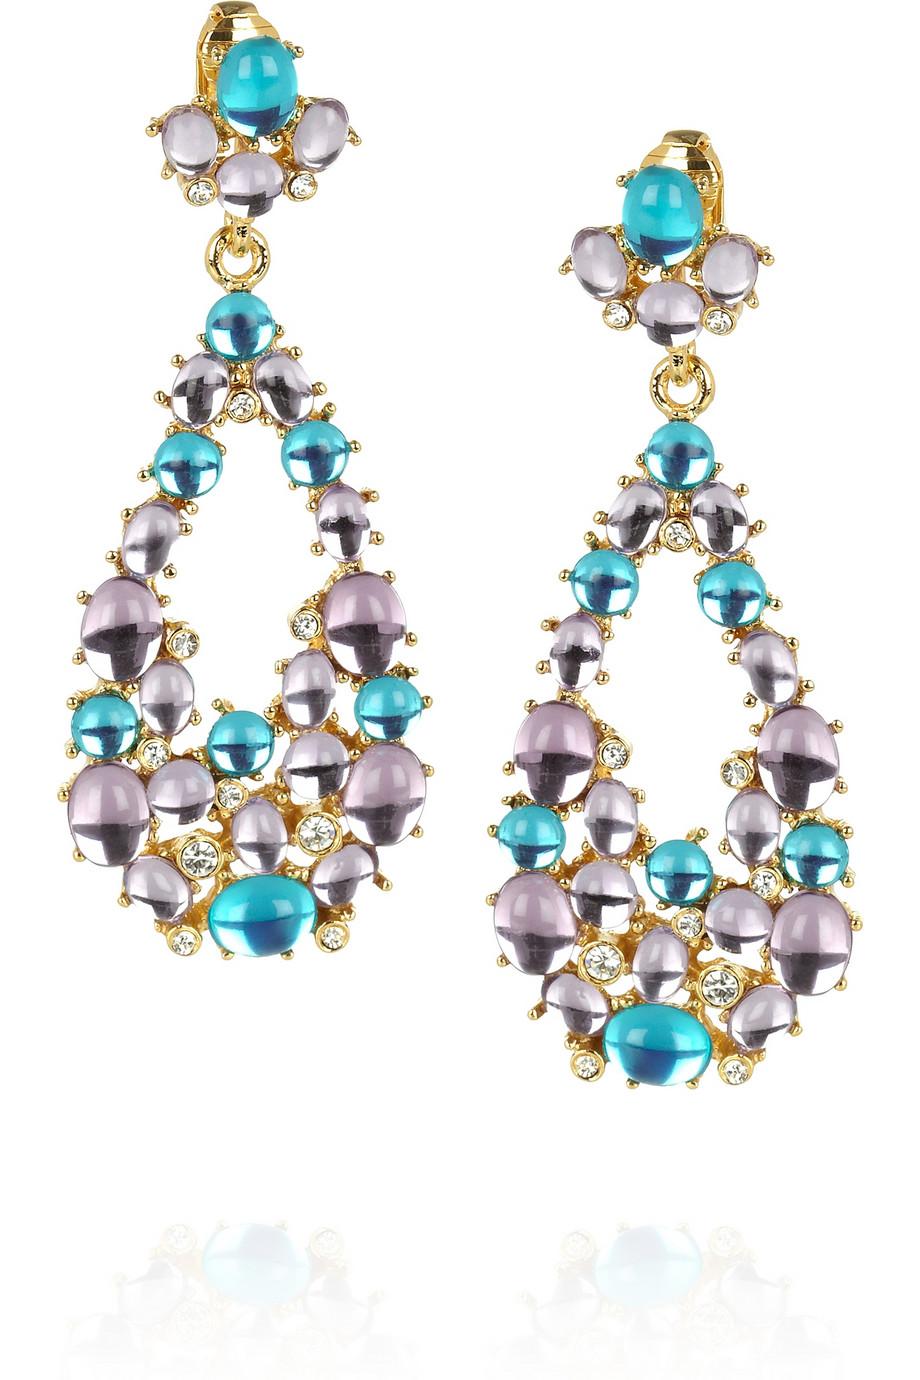 Kenneth Jay Lane Gold Crystal Nugget Clip Earrings Gold dyDH15Ljc